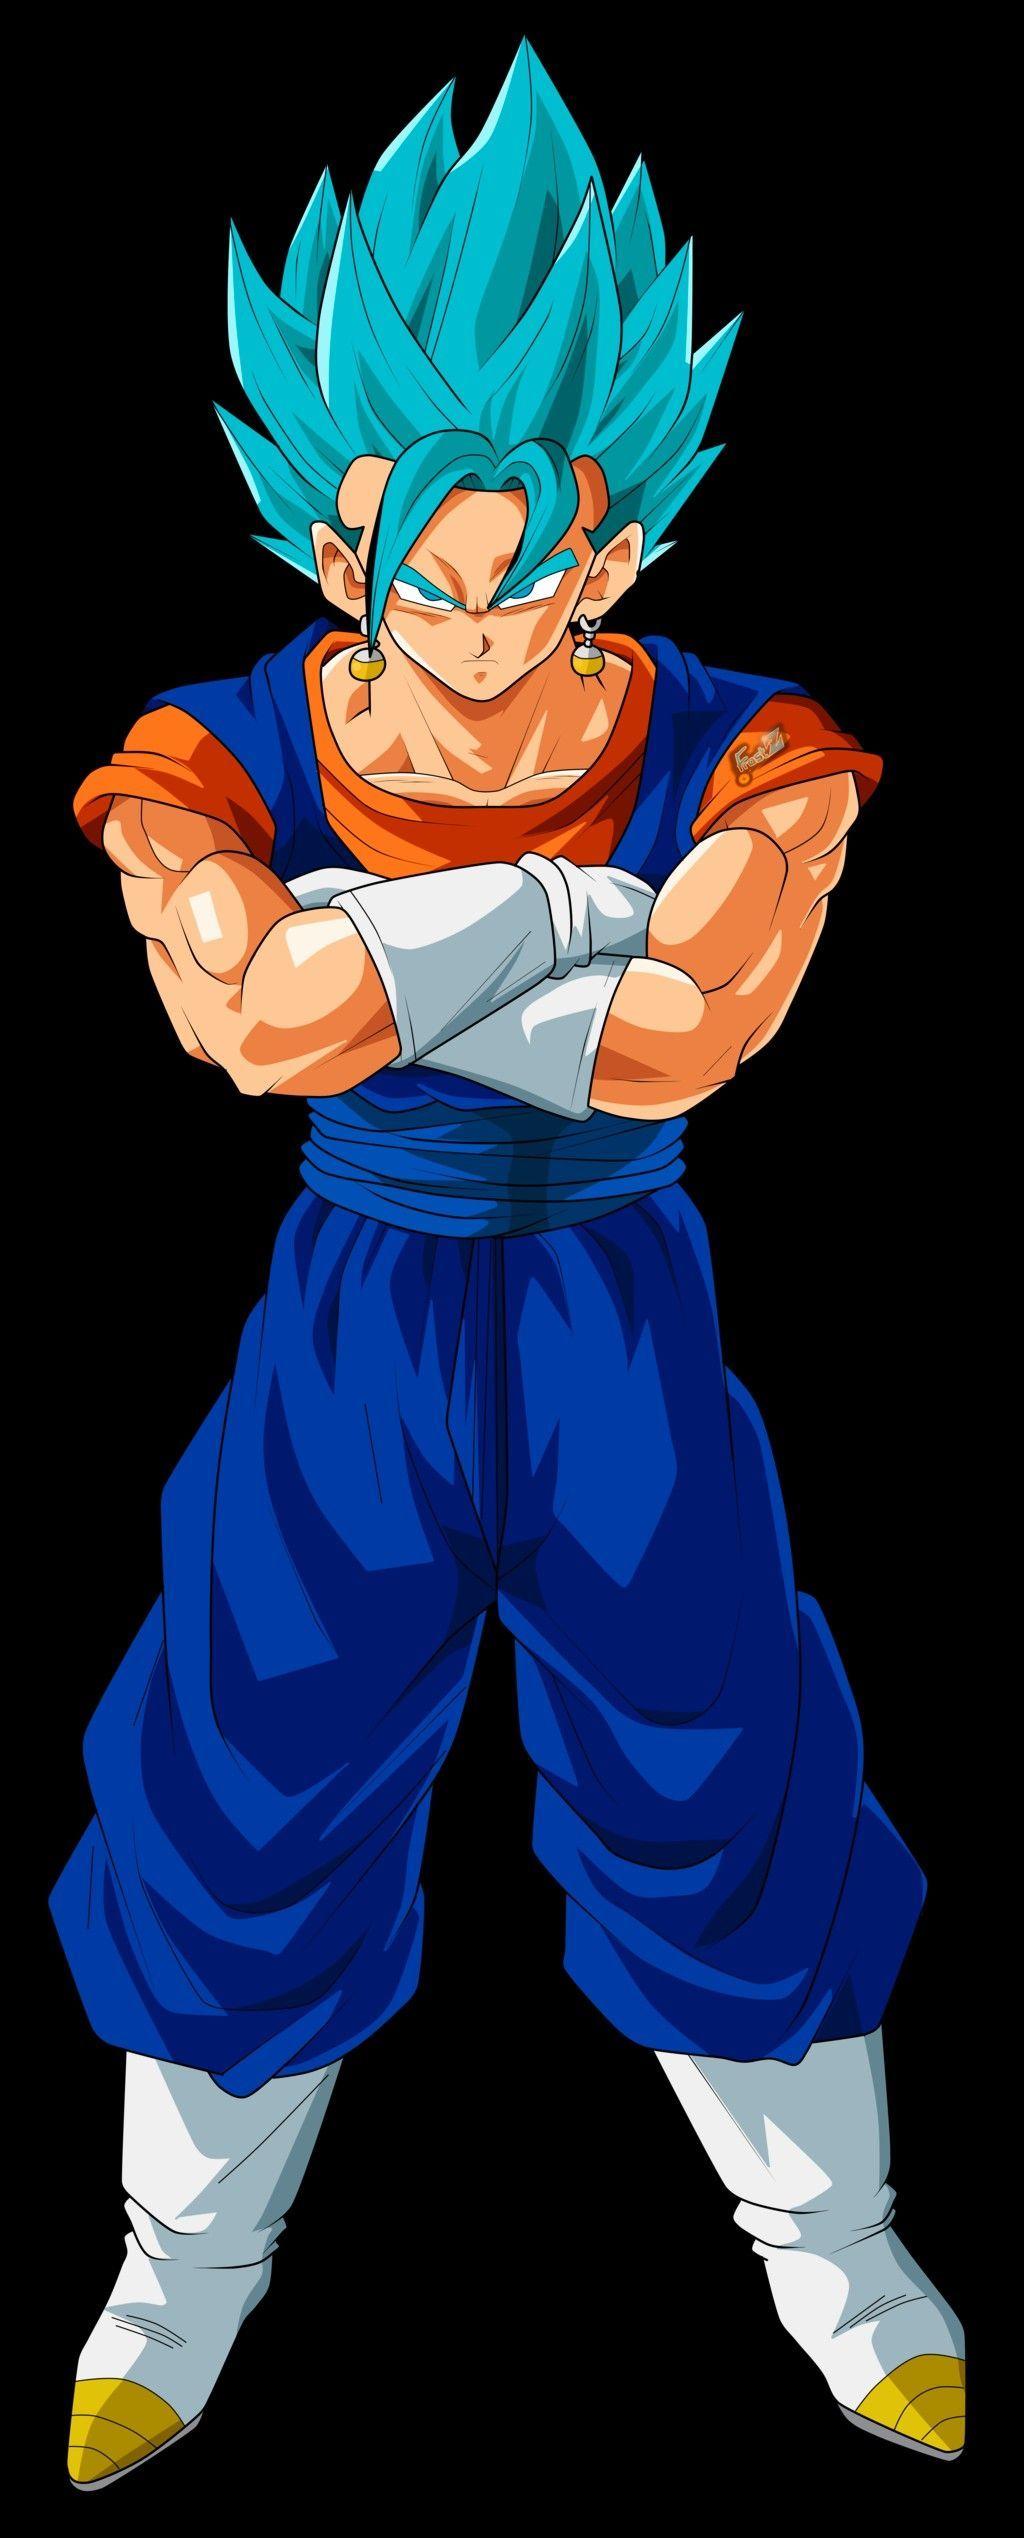 Pinterest Photo Trending Searches Trend Dragon Ball Super Artwork Dragon Ball Super Manga Dragon Ball Goku